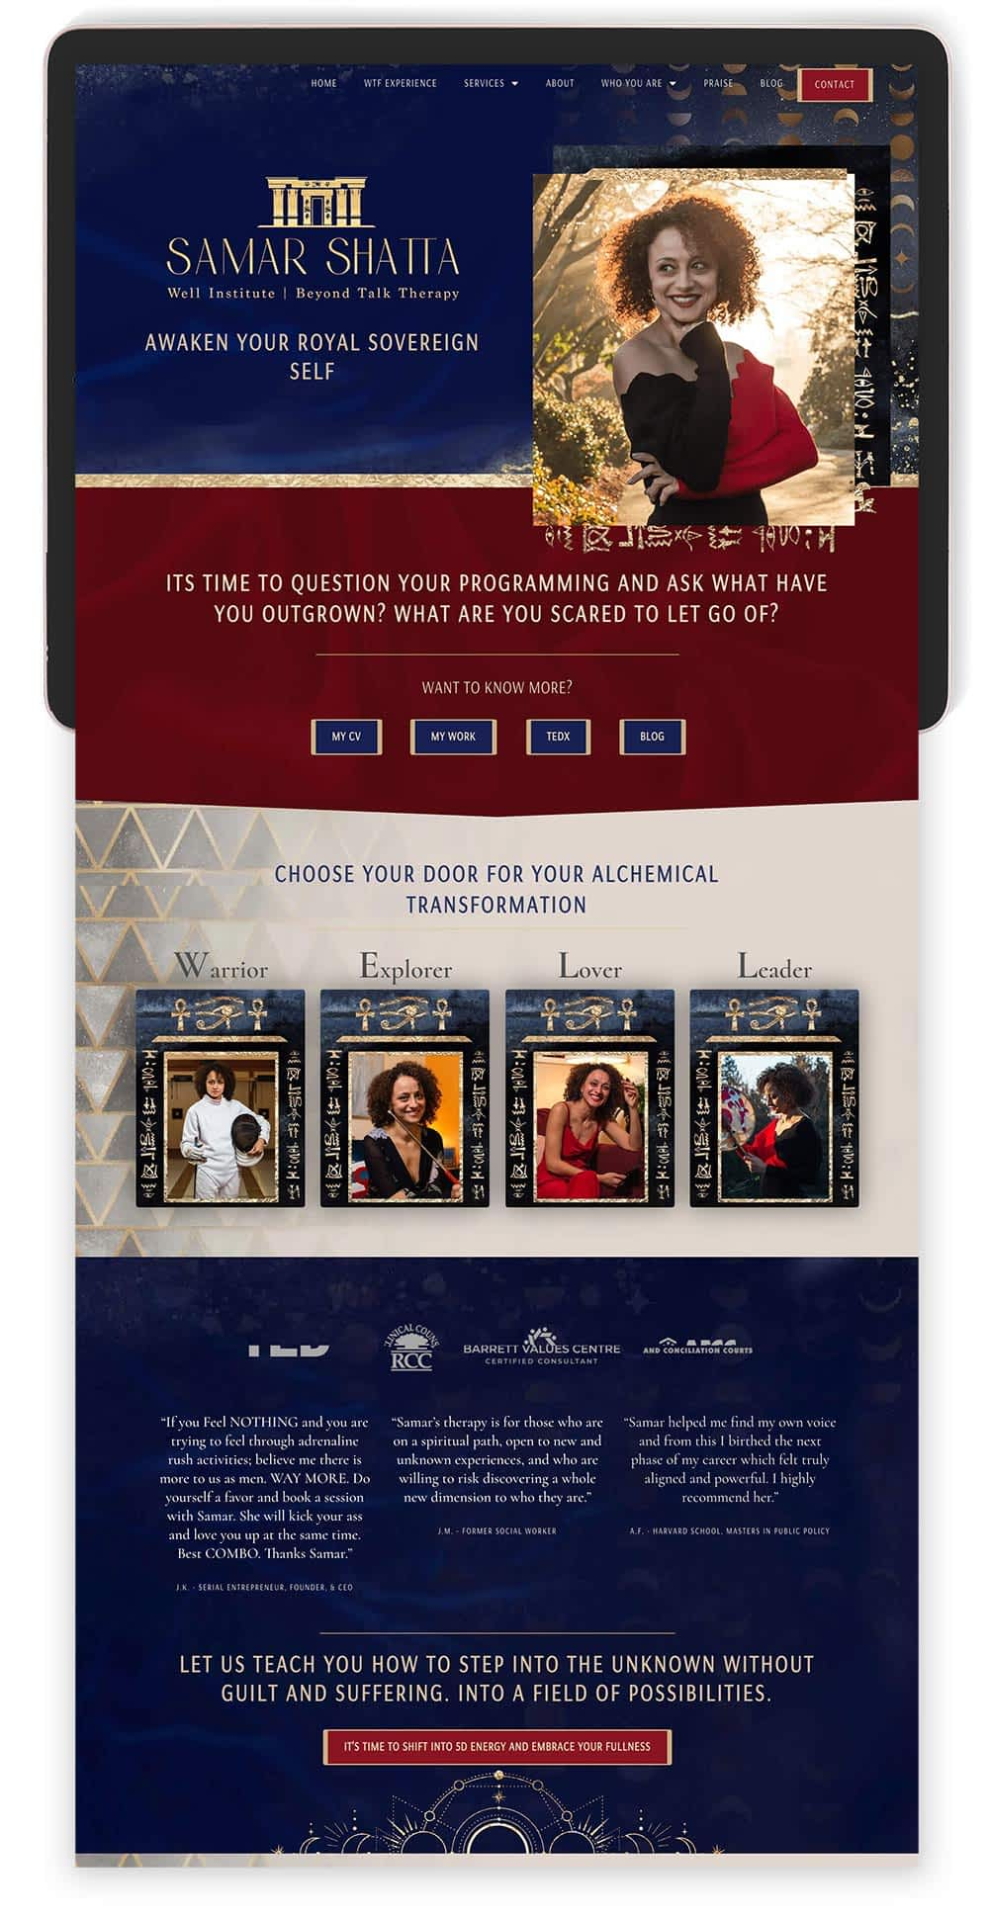 Image of Samar Shatta's Website by Tracy Raftl Design